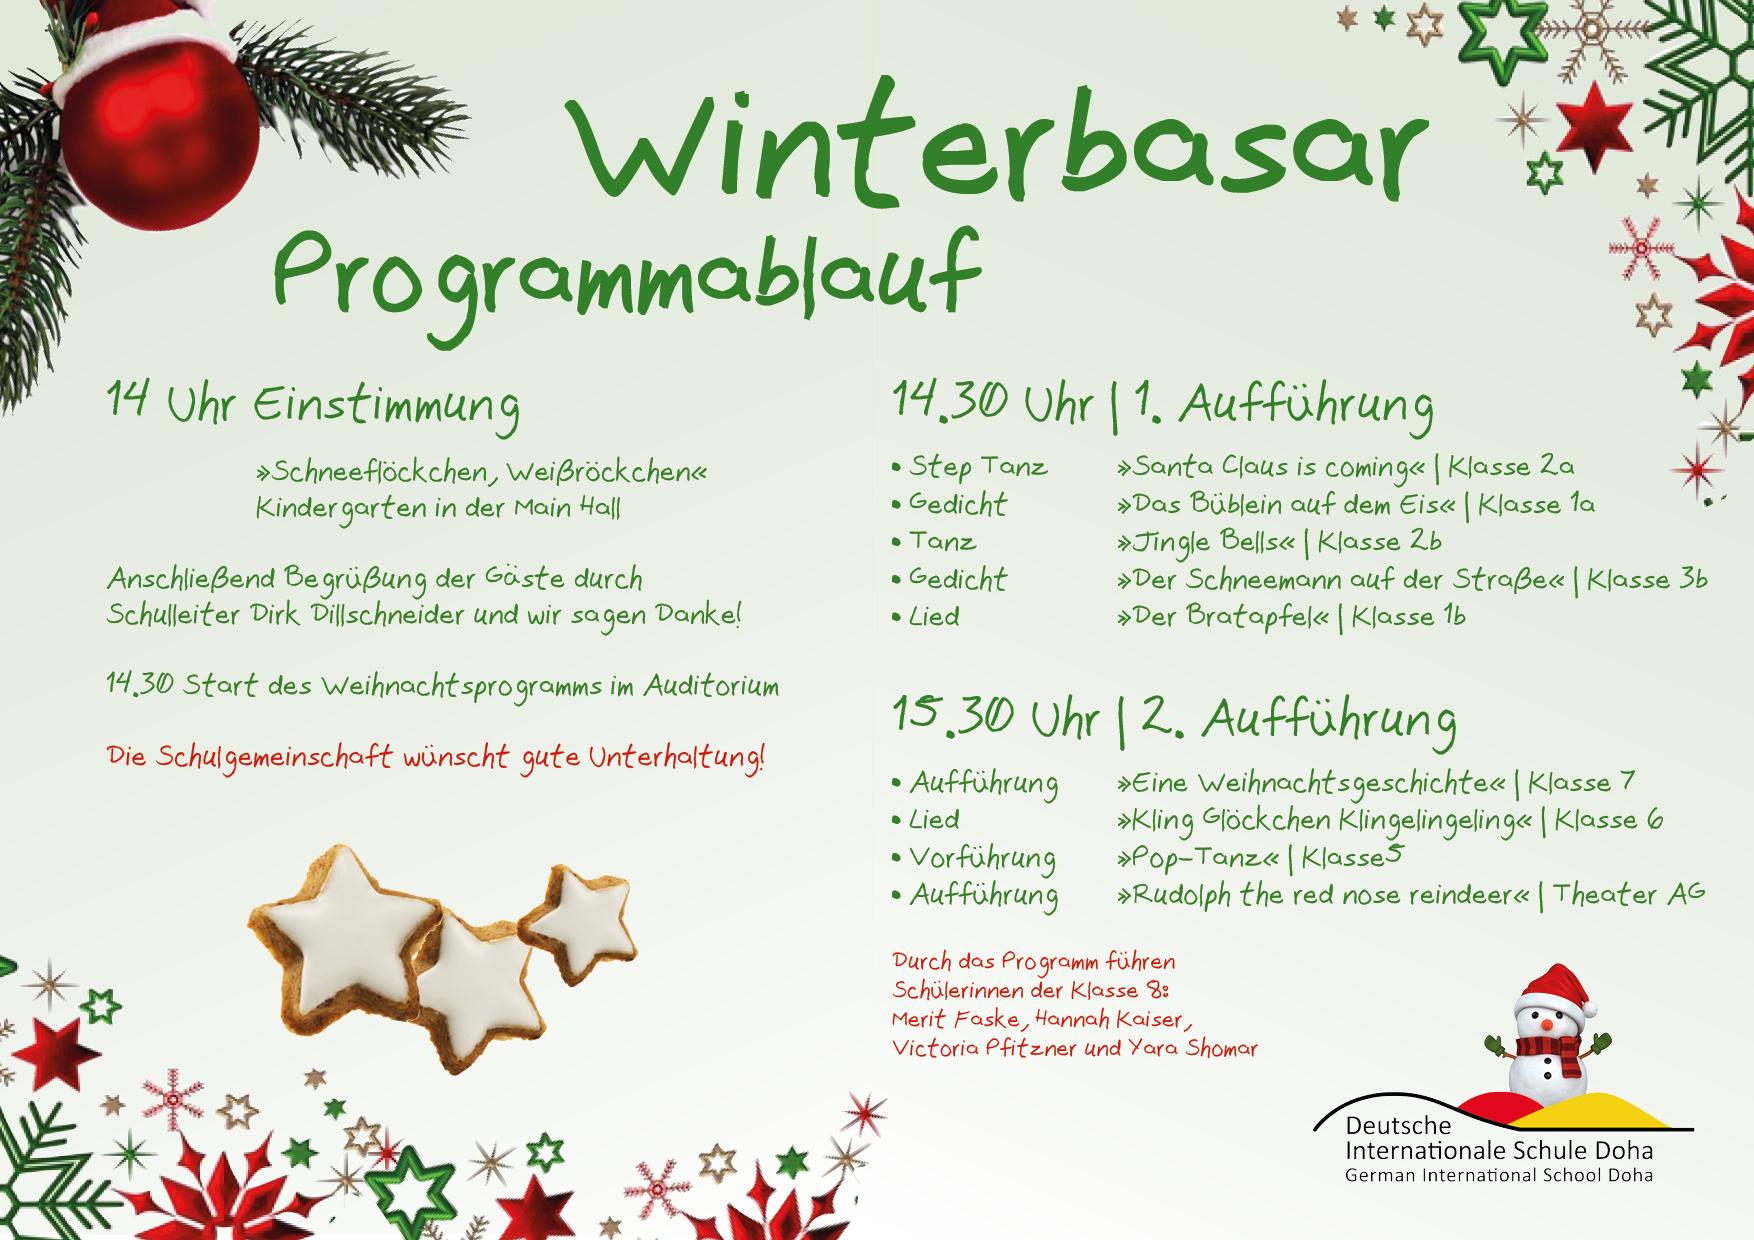 Winterbasar Programmablauf